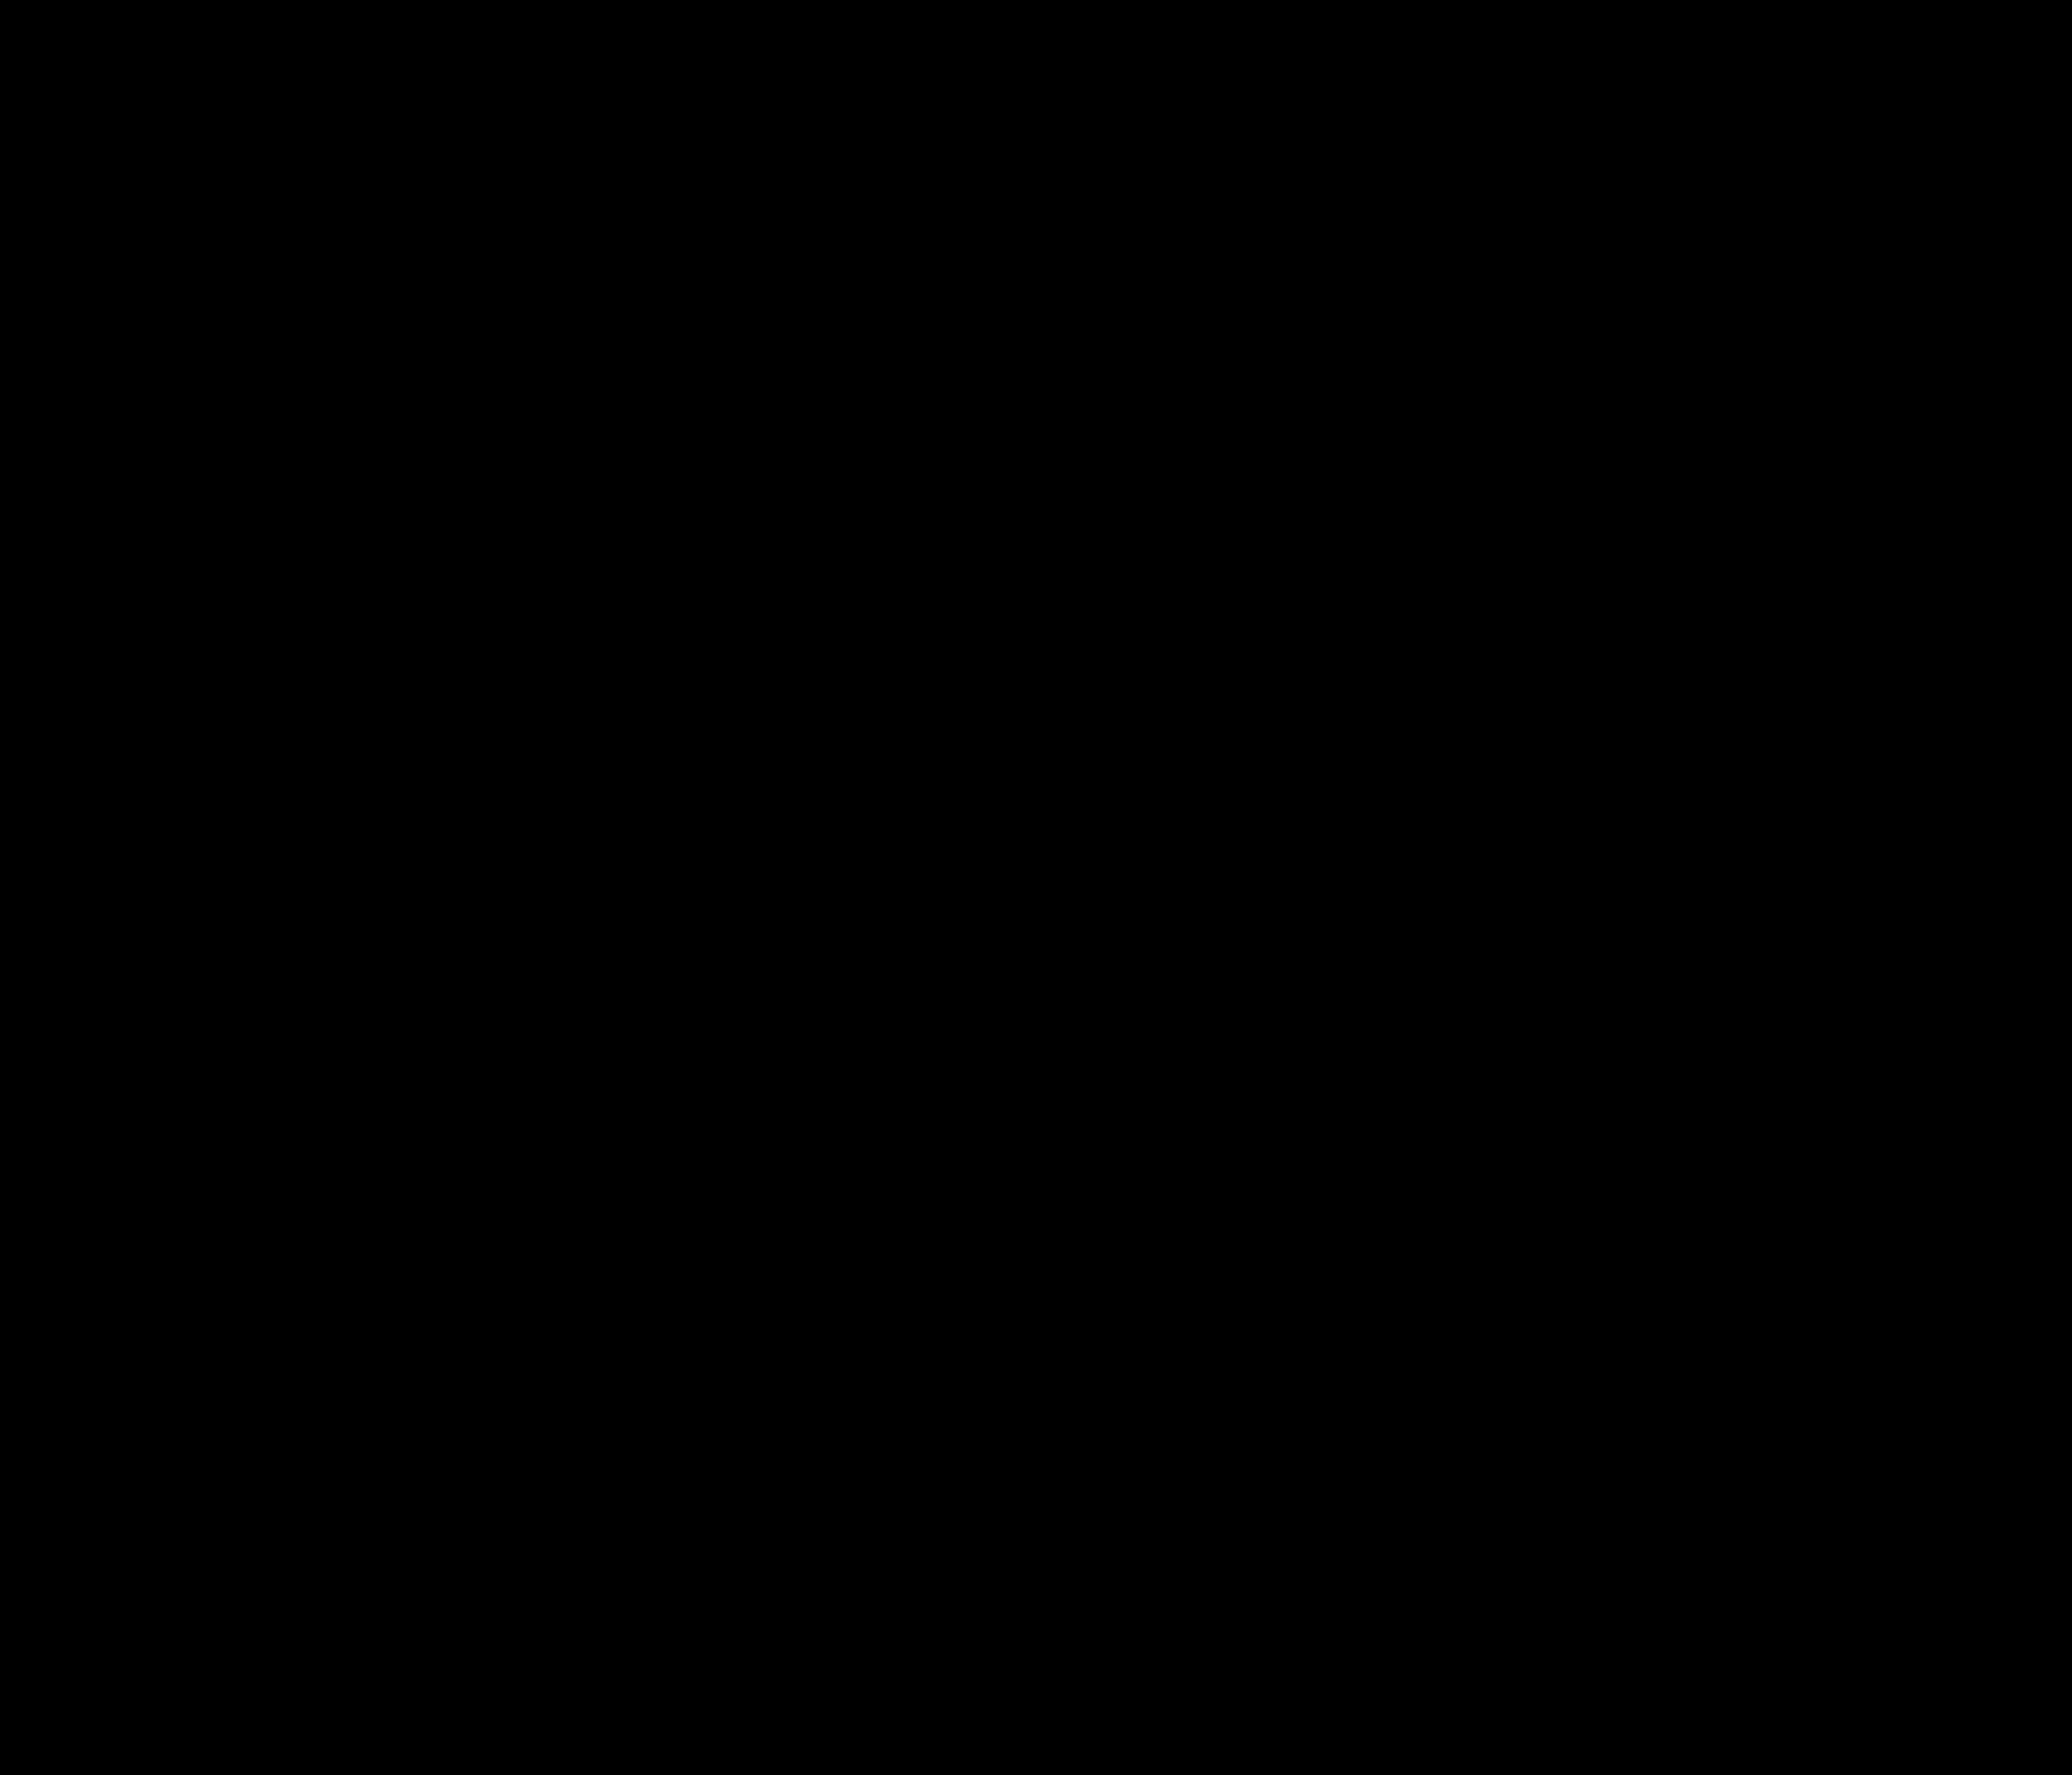 TROJAN » Emblems for Battlefield 1, Battlefield 4, Battlefield Hardline